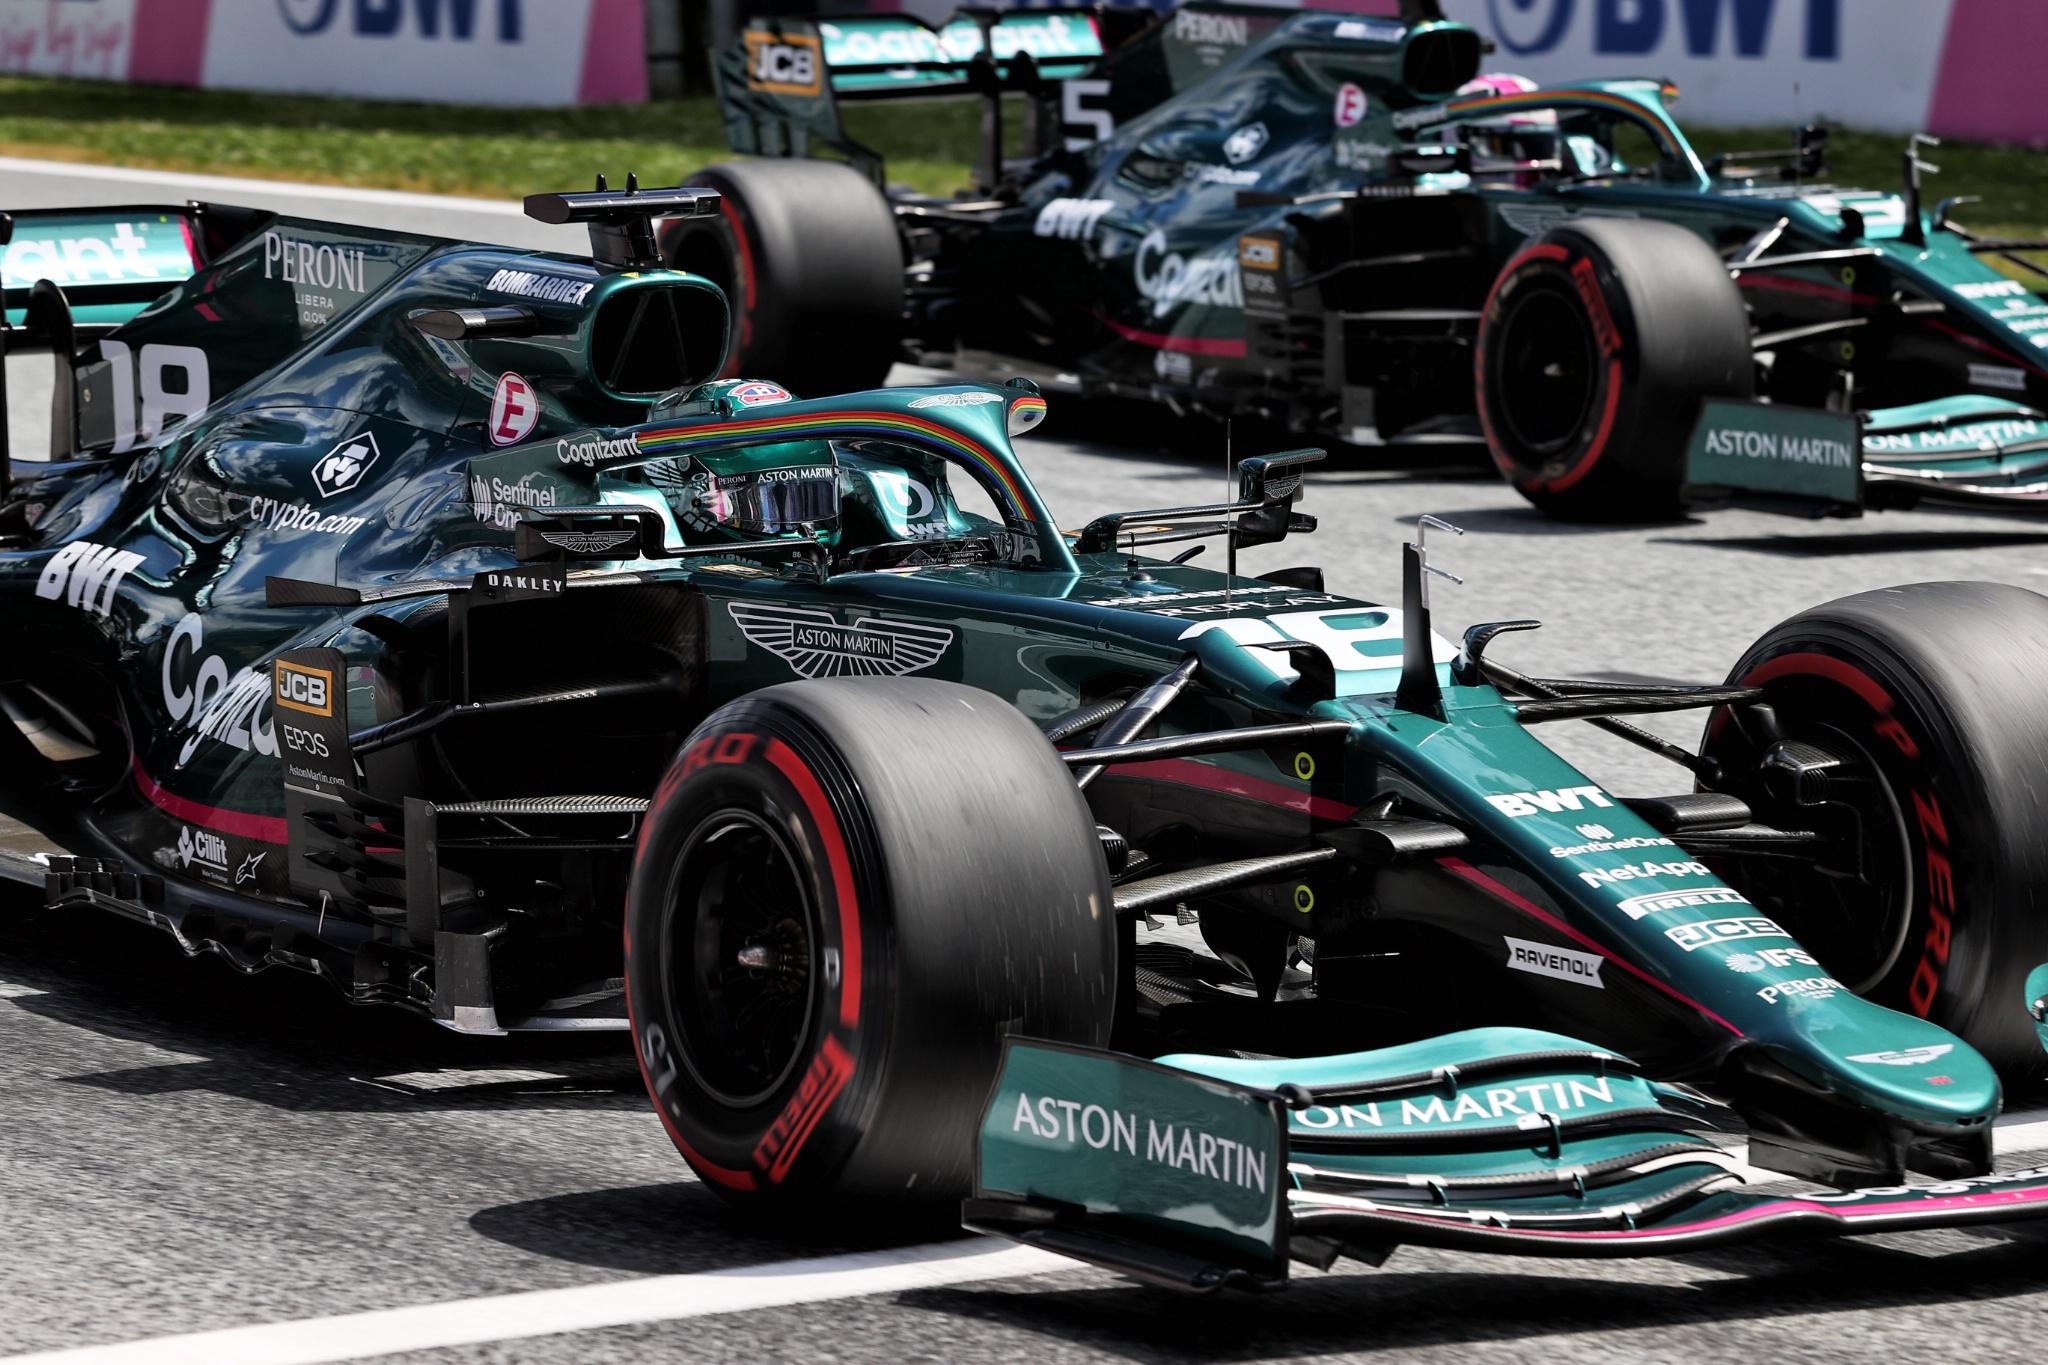 Lance Stroll (CDN) Aston Martin F1 Team AMR21 dan Sebastian Vettel (GER) Aston Martin F1 Team AMR21 - latihan dimulai.